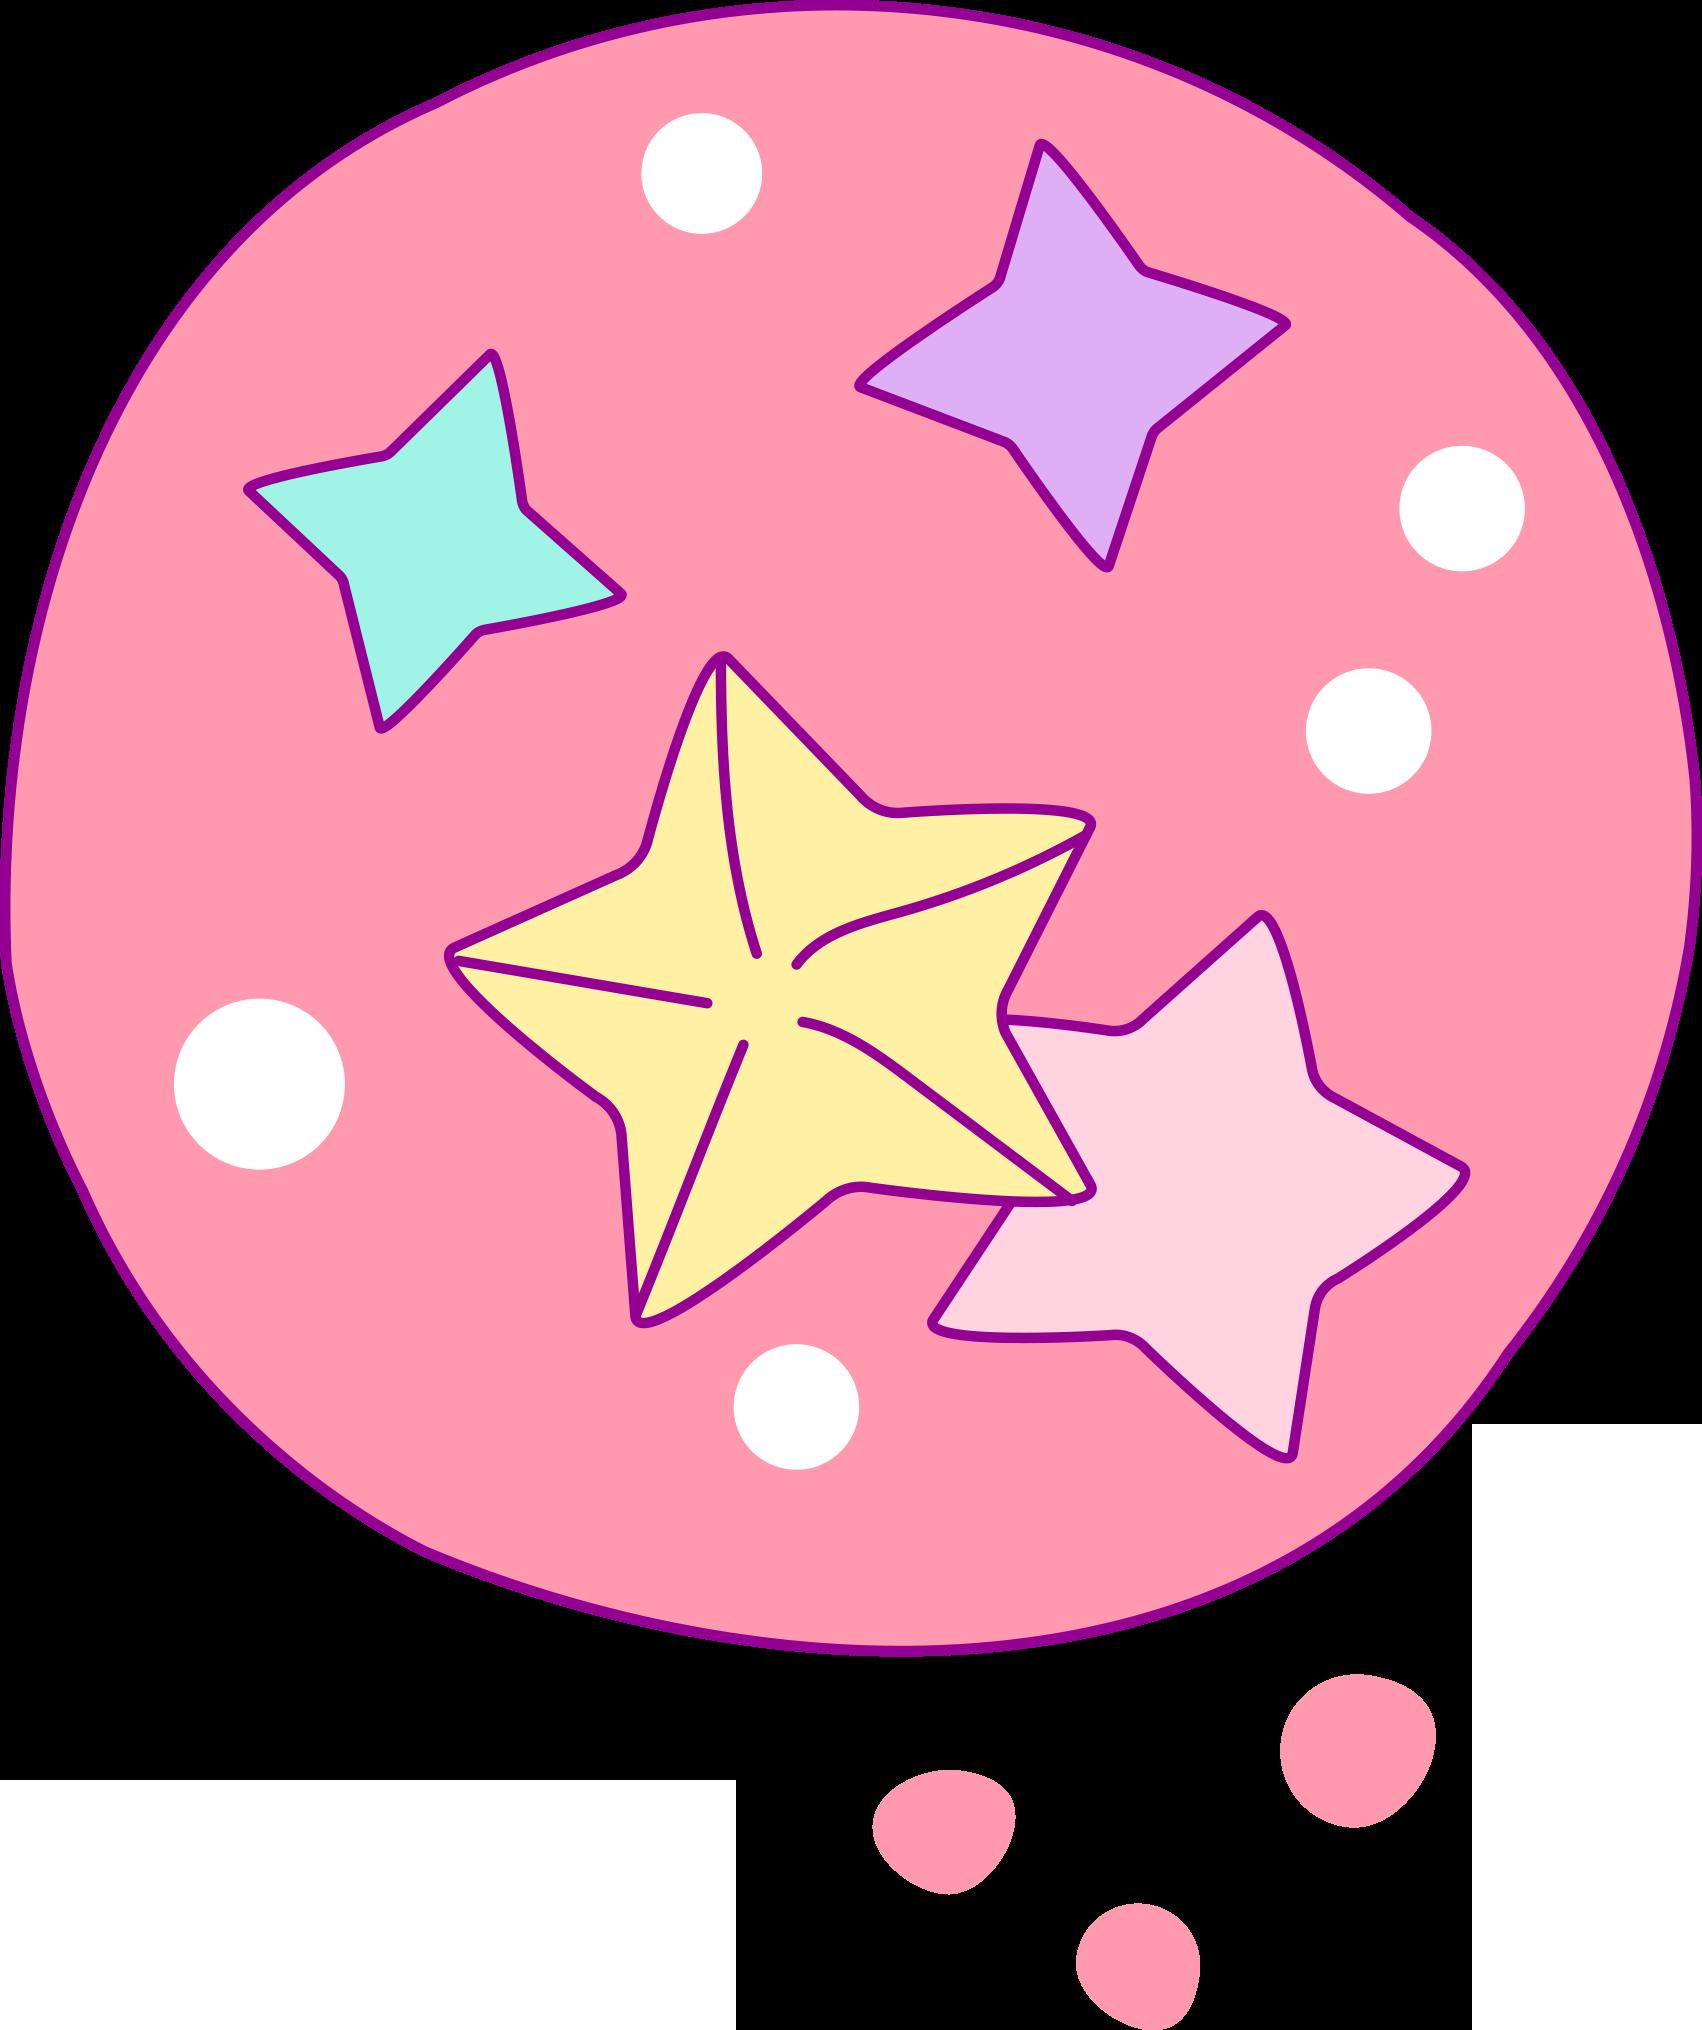 Clip Art Freehand Circle - eClip Art